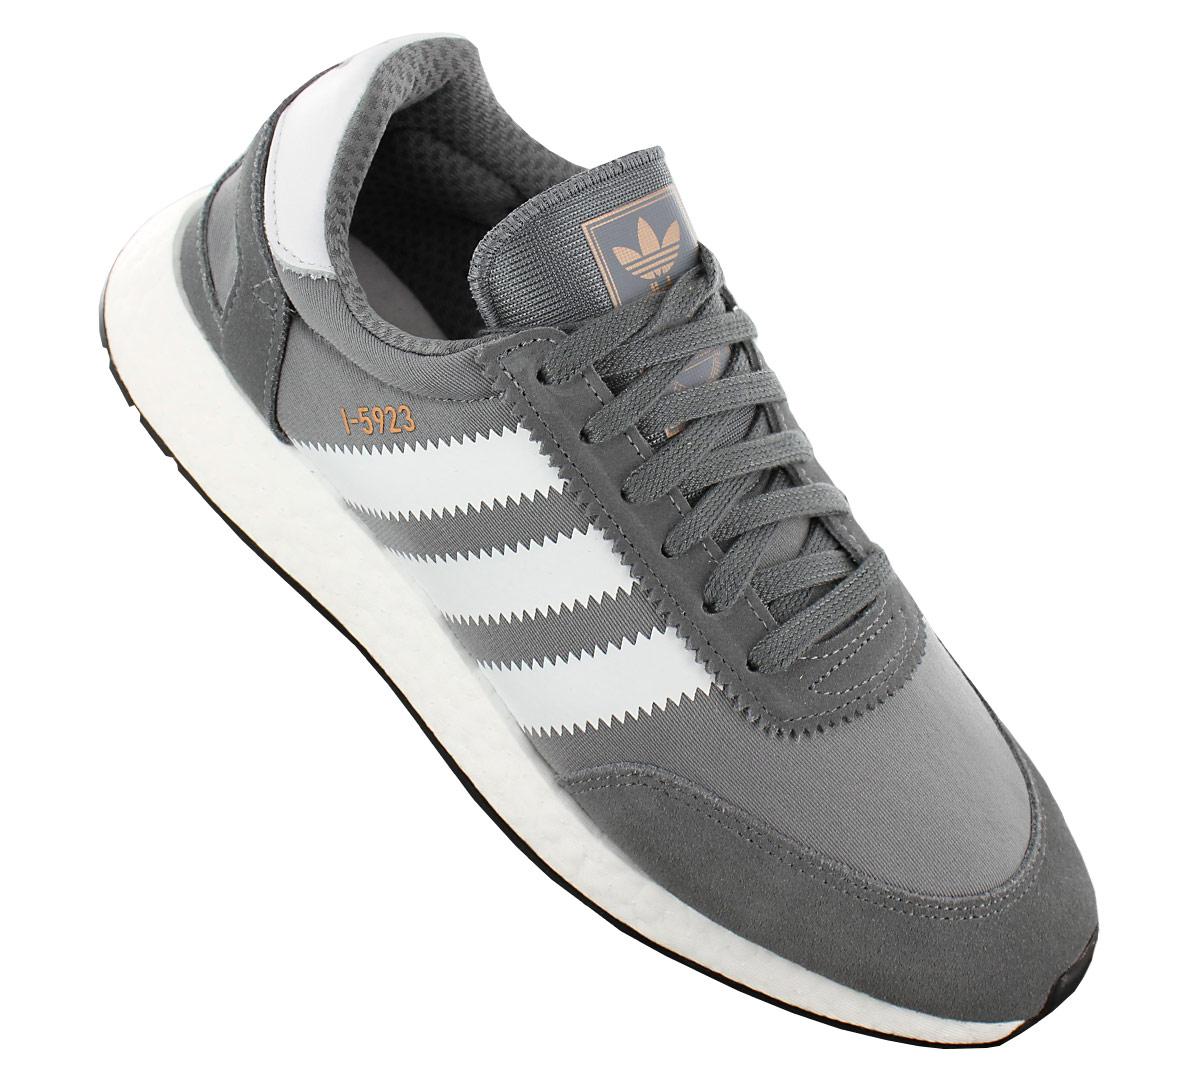 Details zu adidas Originals Iniki I 5923 Boost Herren Sneaker Retro Schuhe BB2089 Turnschuh